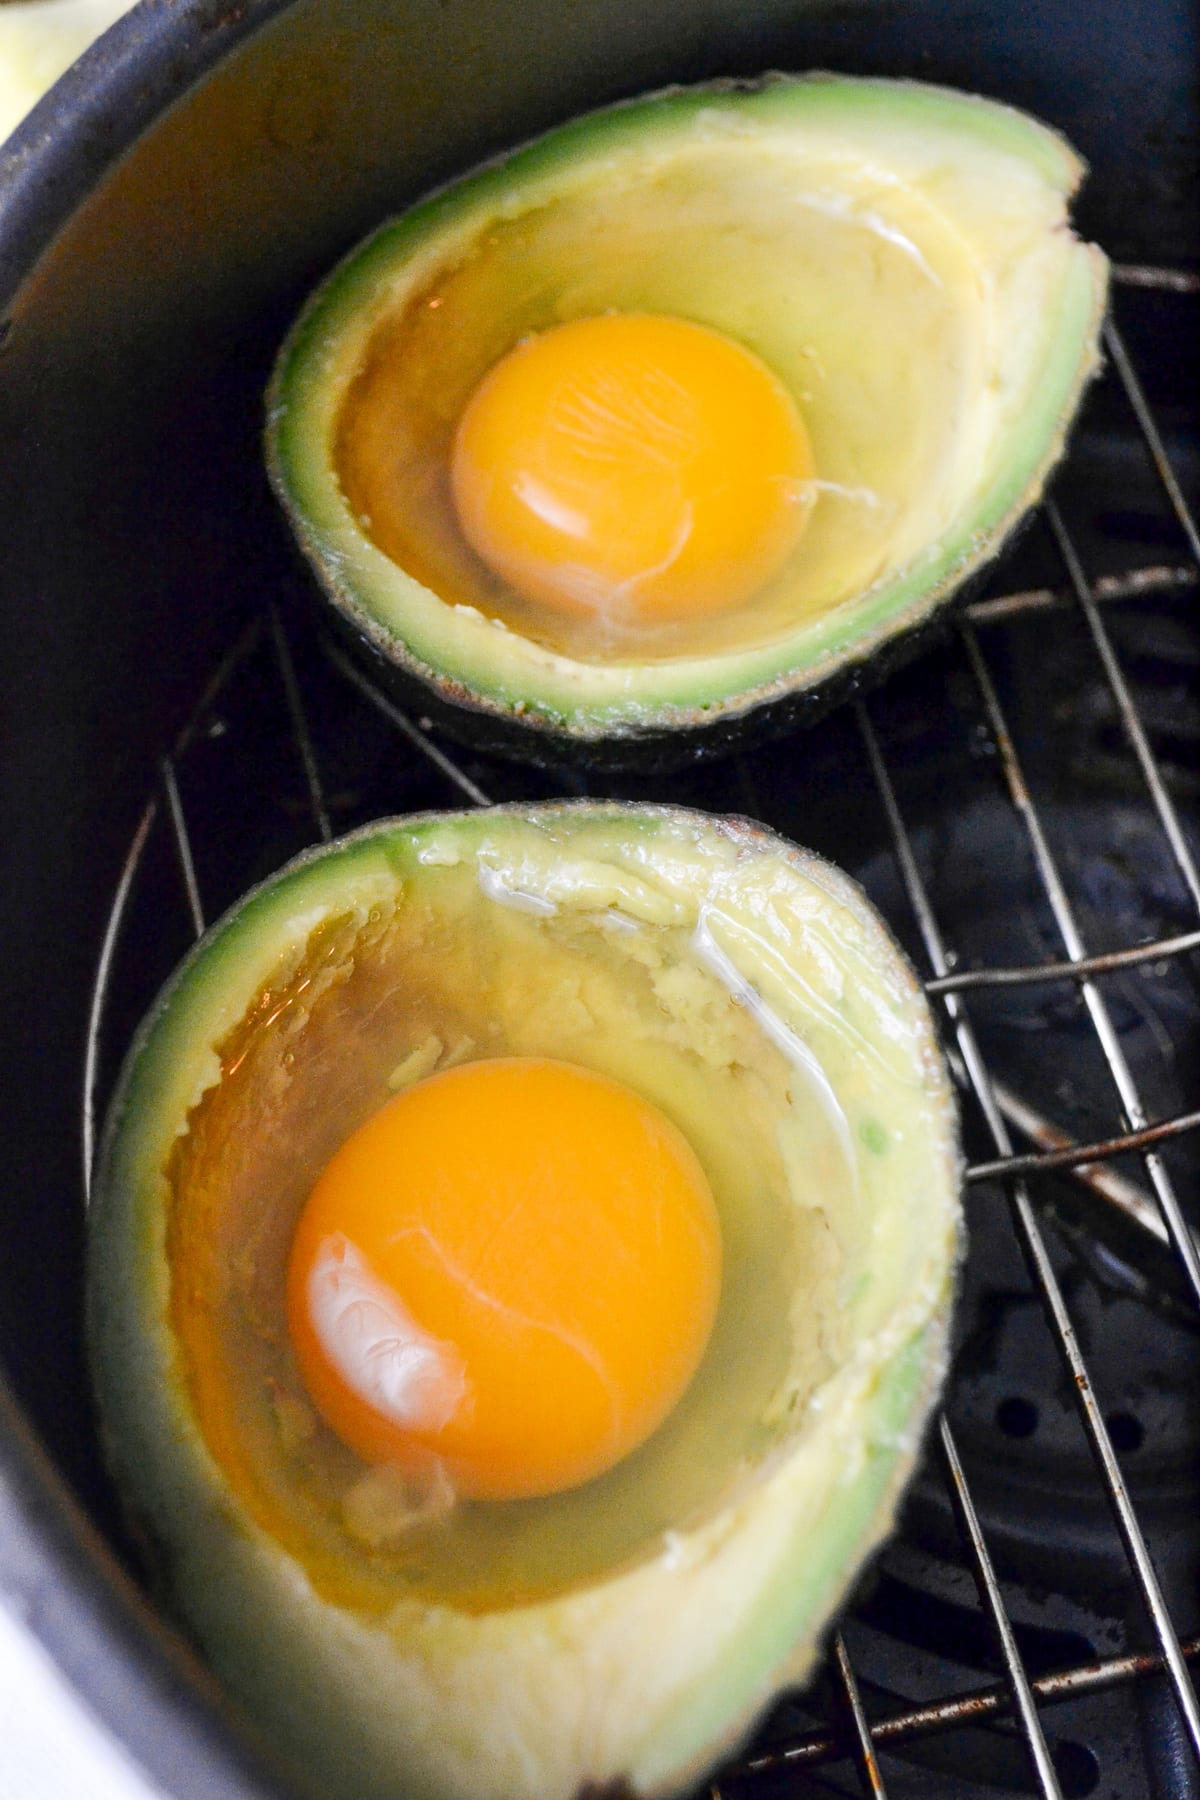 Keto Air Fryer Avocado Baked Egg prep